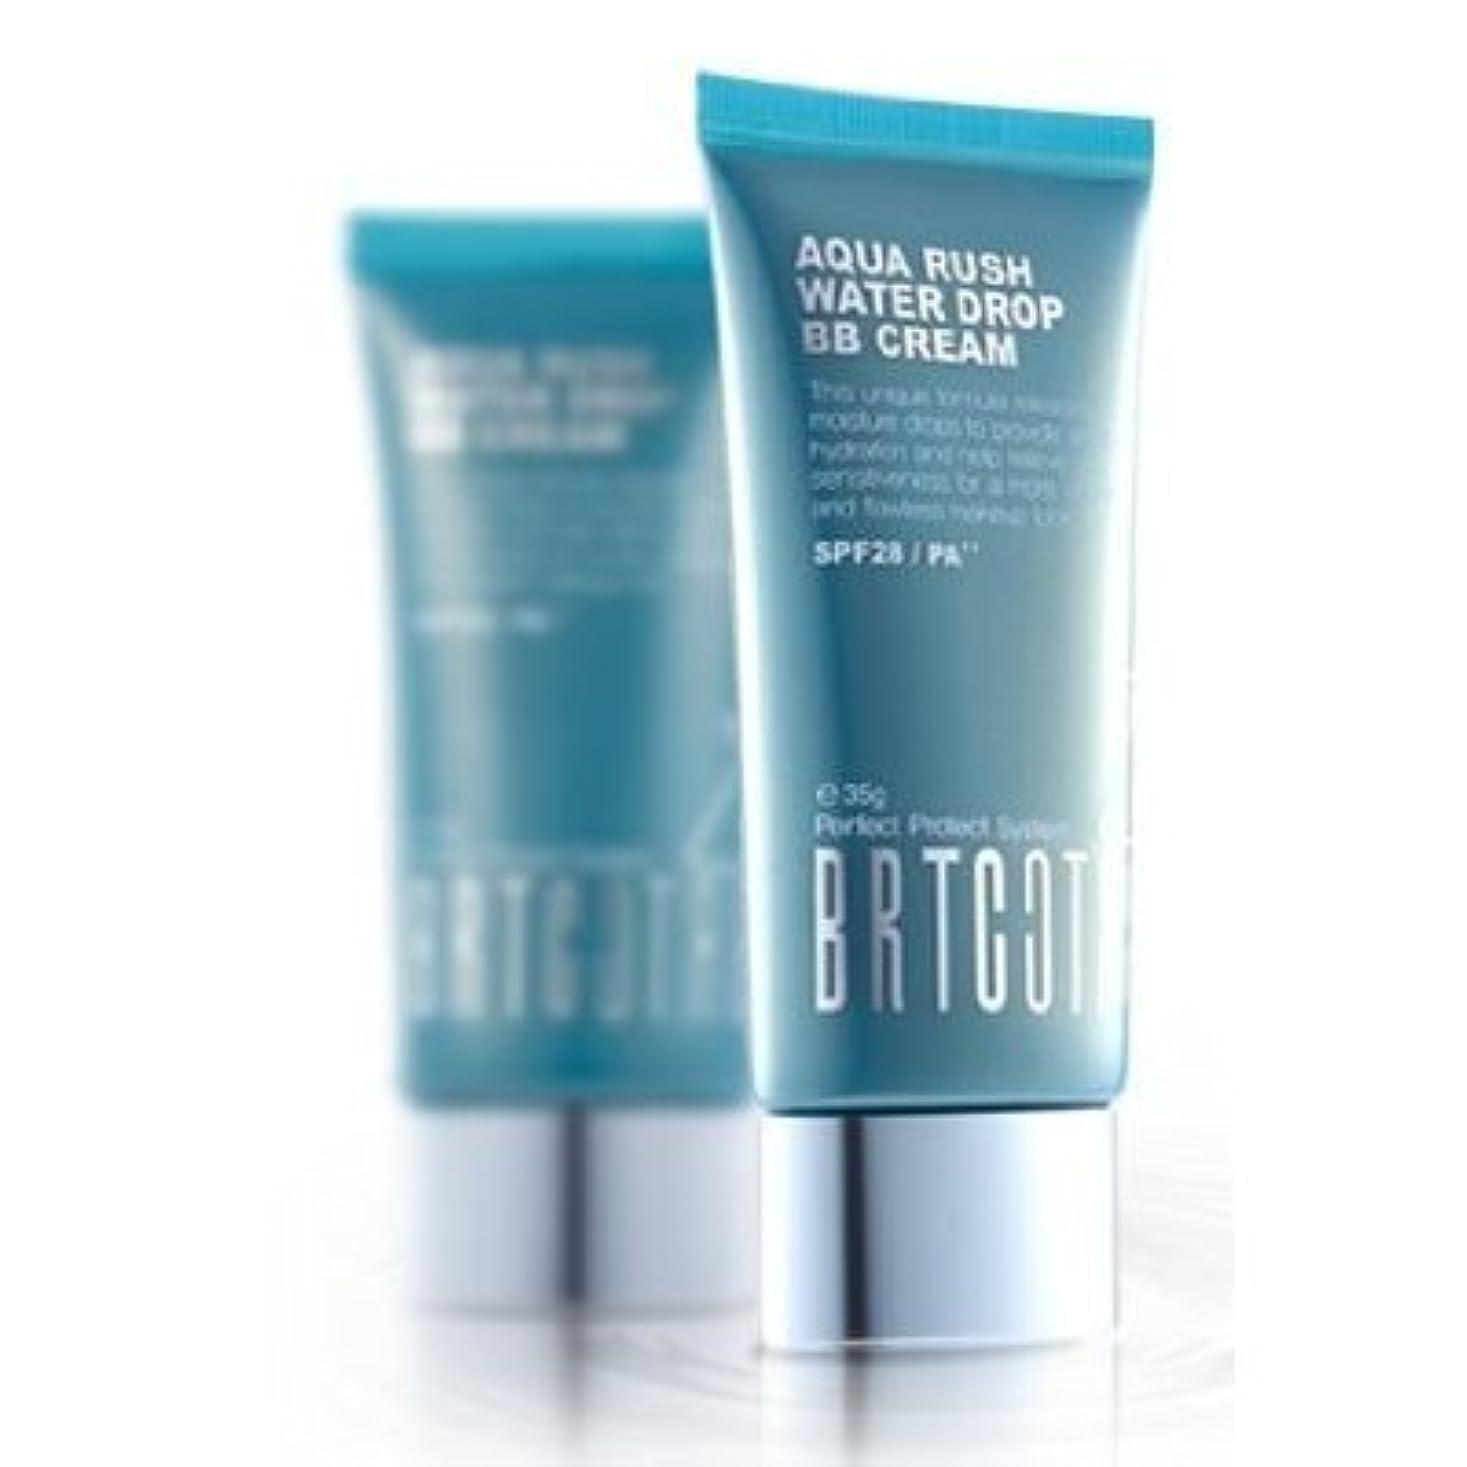 KOREAN COSMETICS, BRTC, Aqua Rush Water Drop BB Cream 60g (intensive moisturizing, skin tone correction, UV protection...